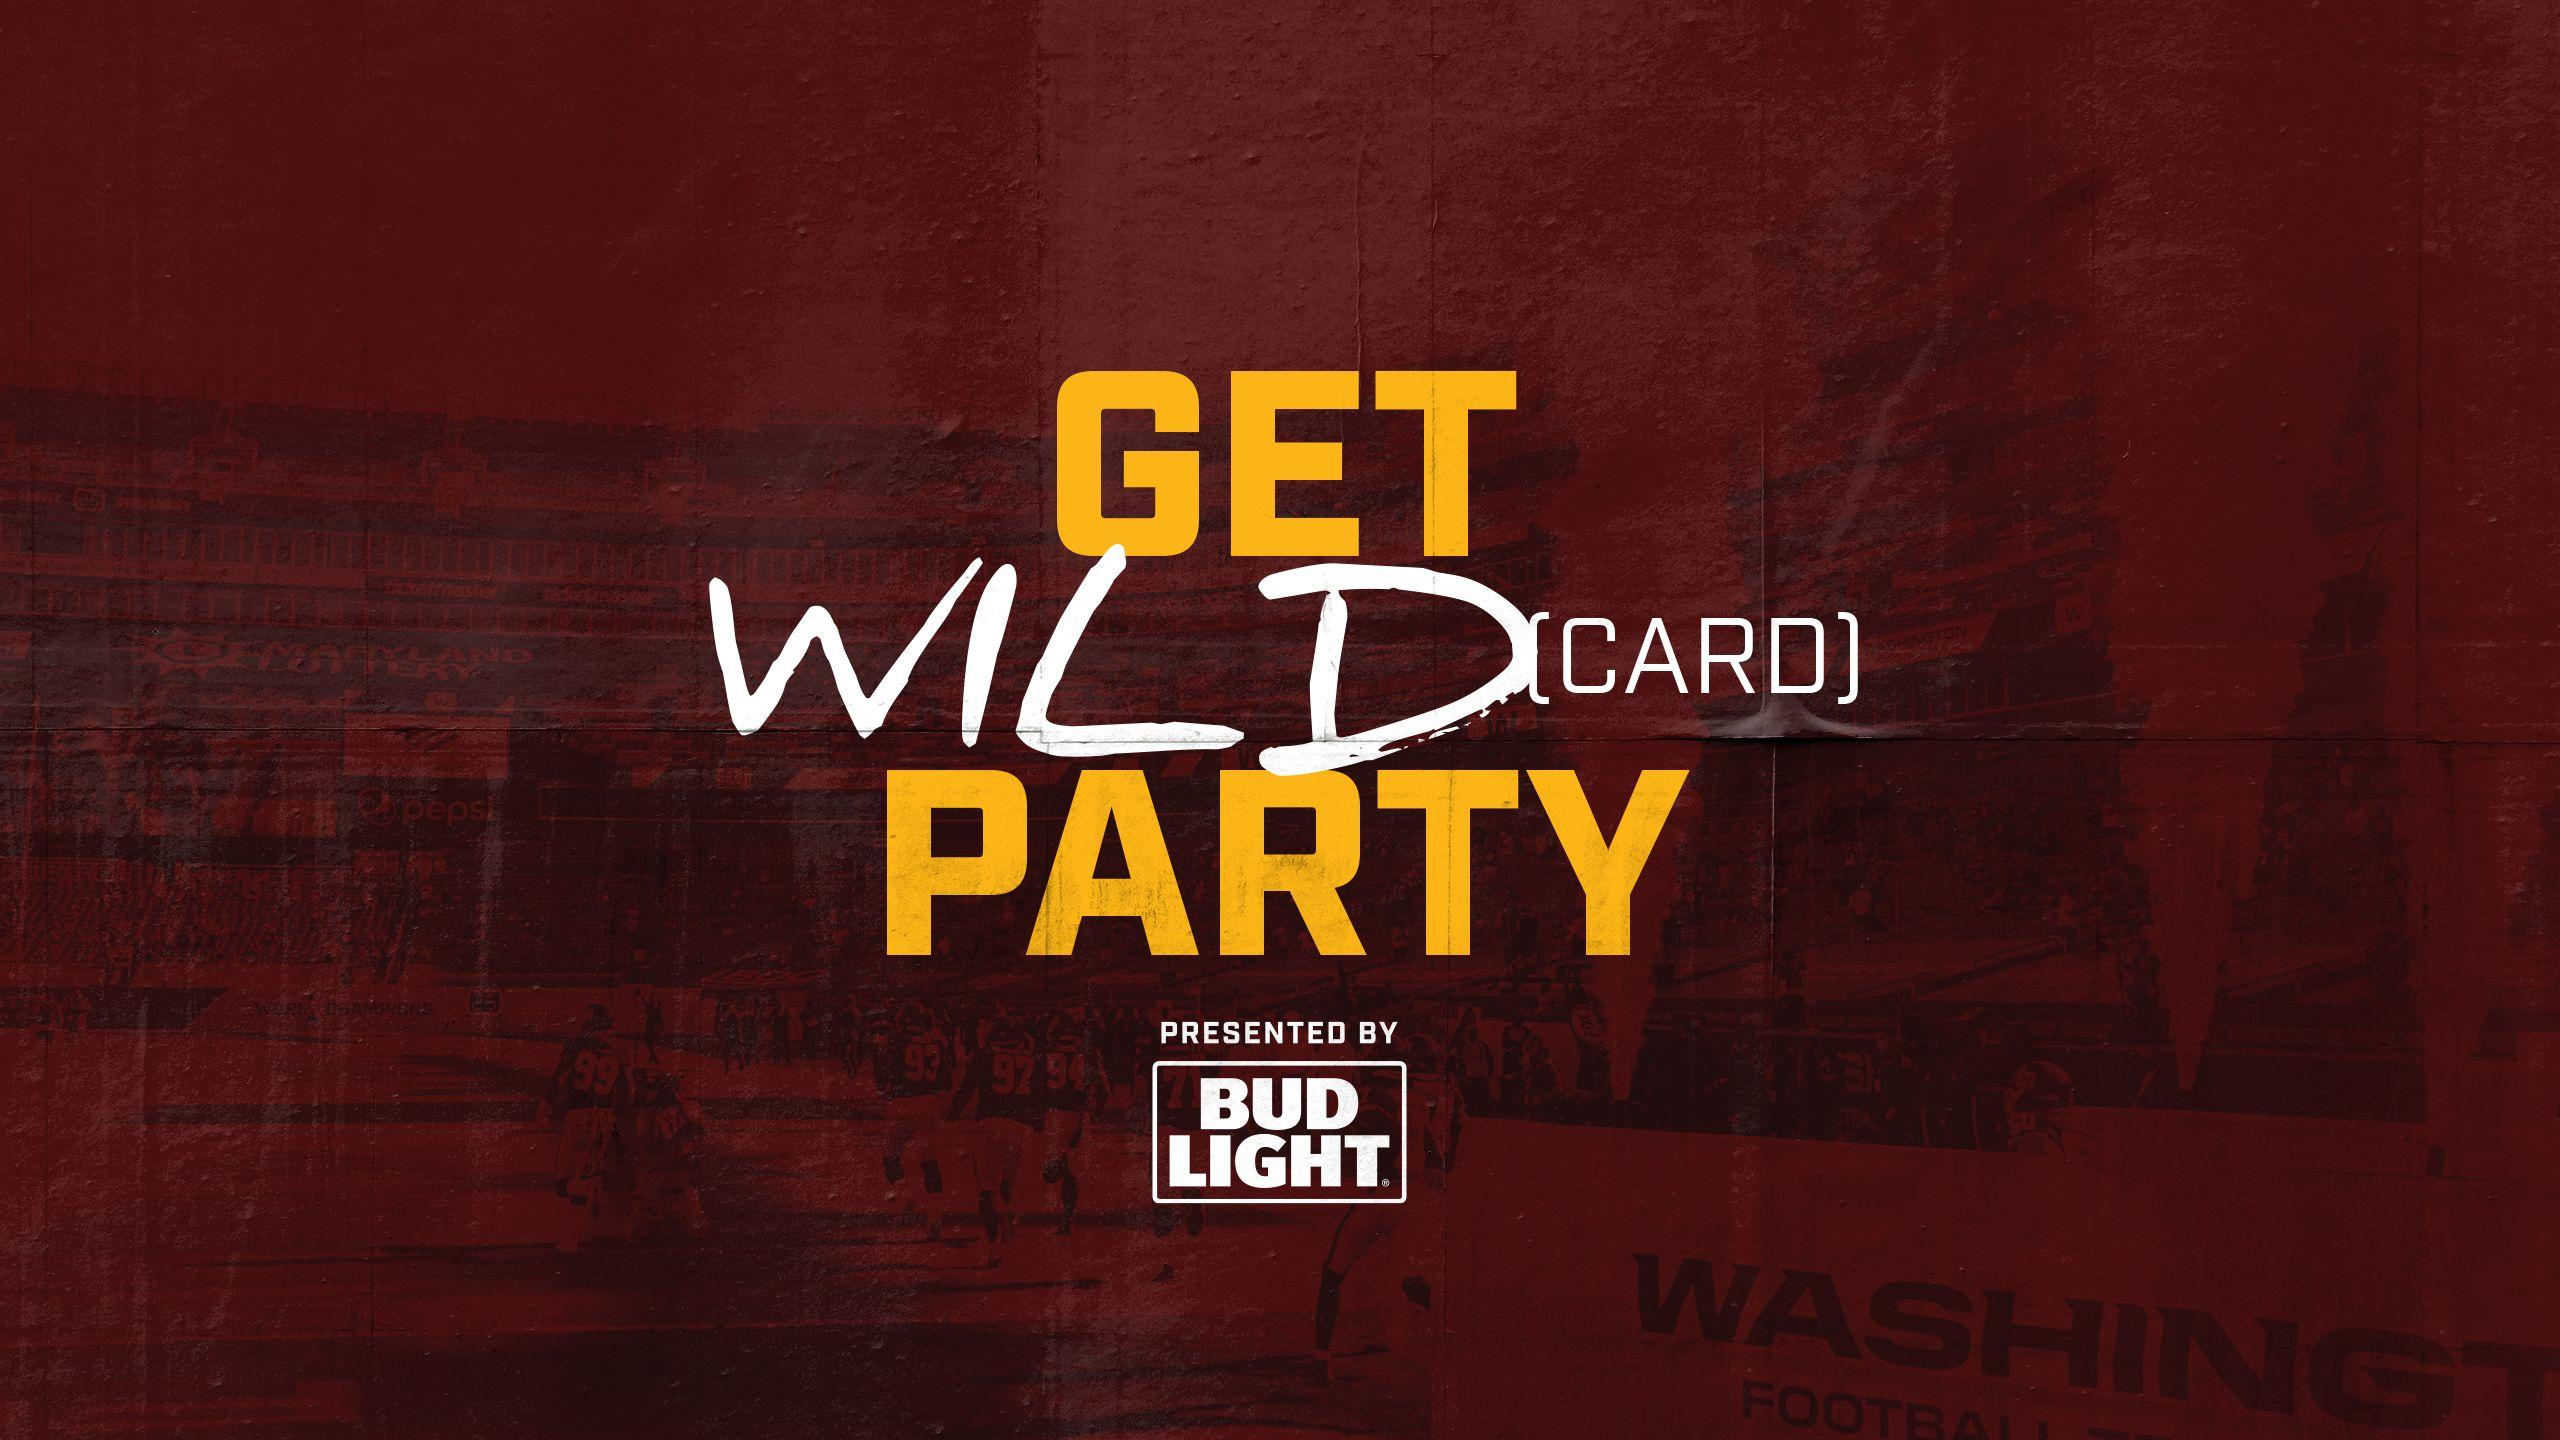 GetWild(Card)Party_SegmentTitle+BudLight_16x9